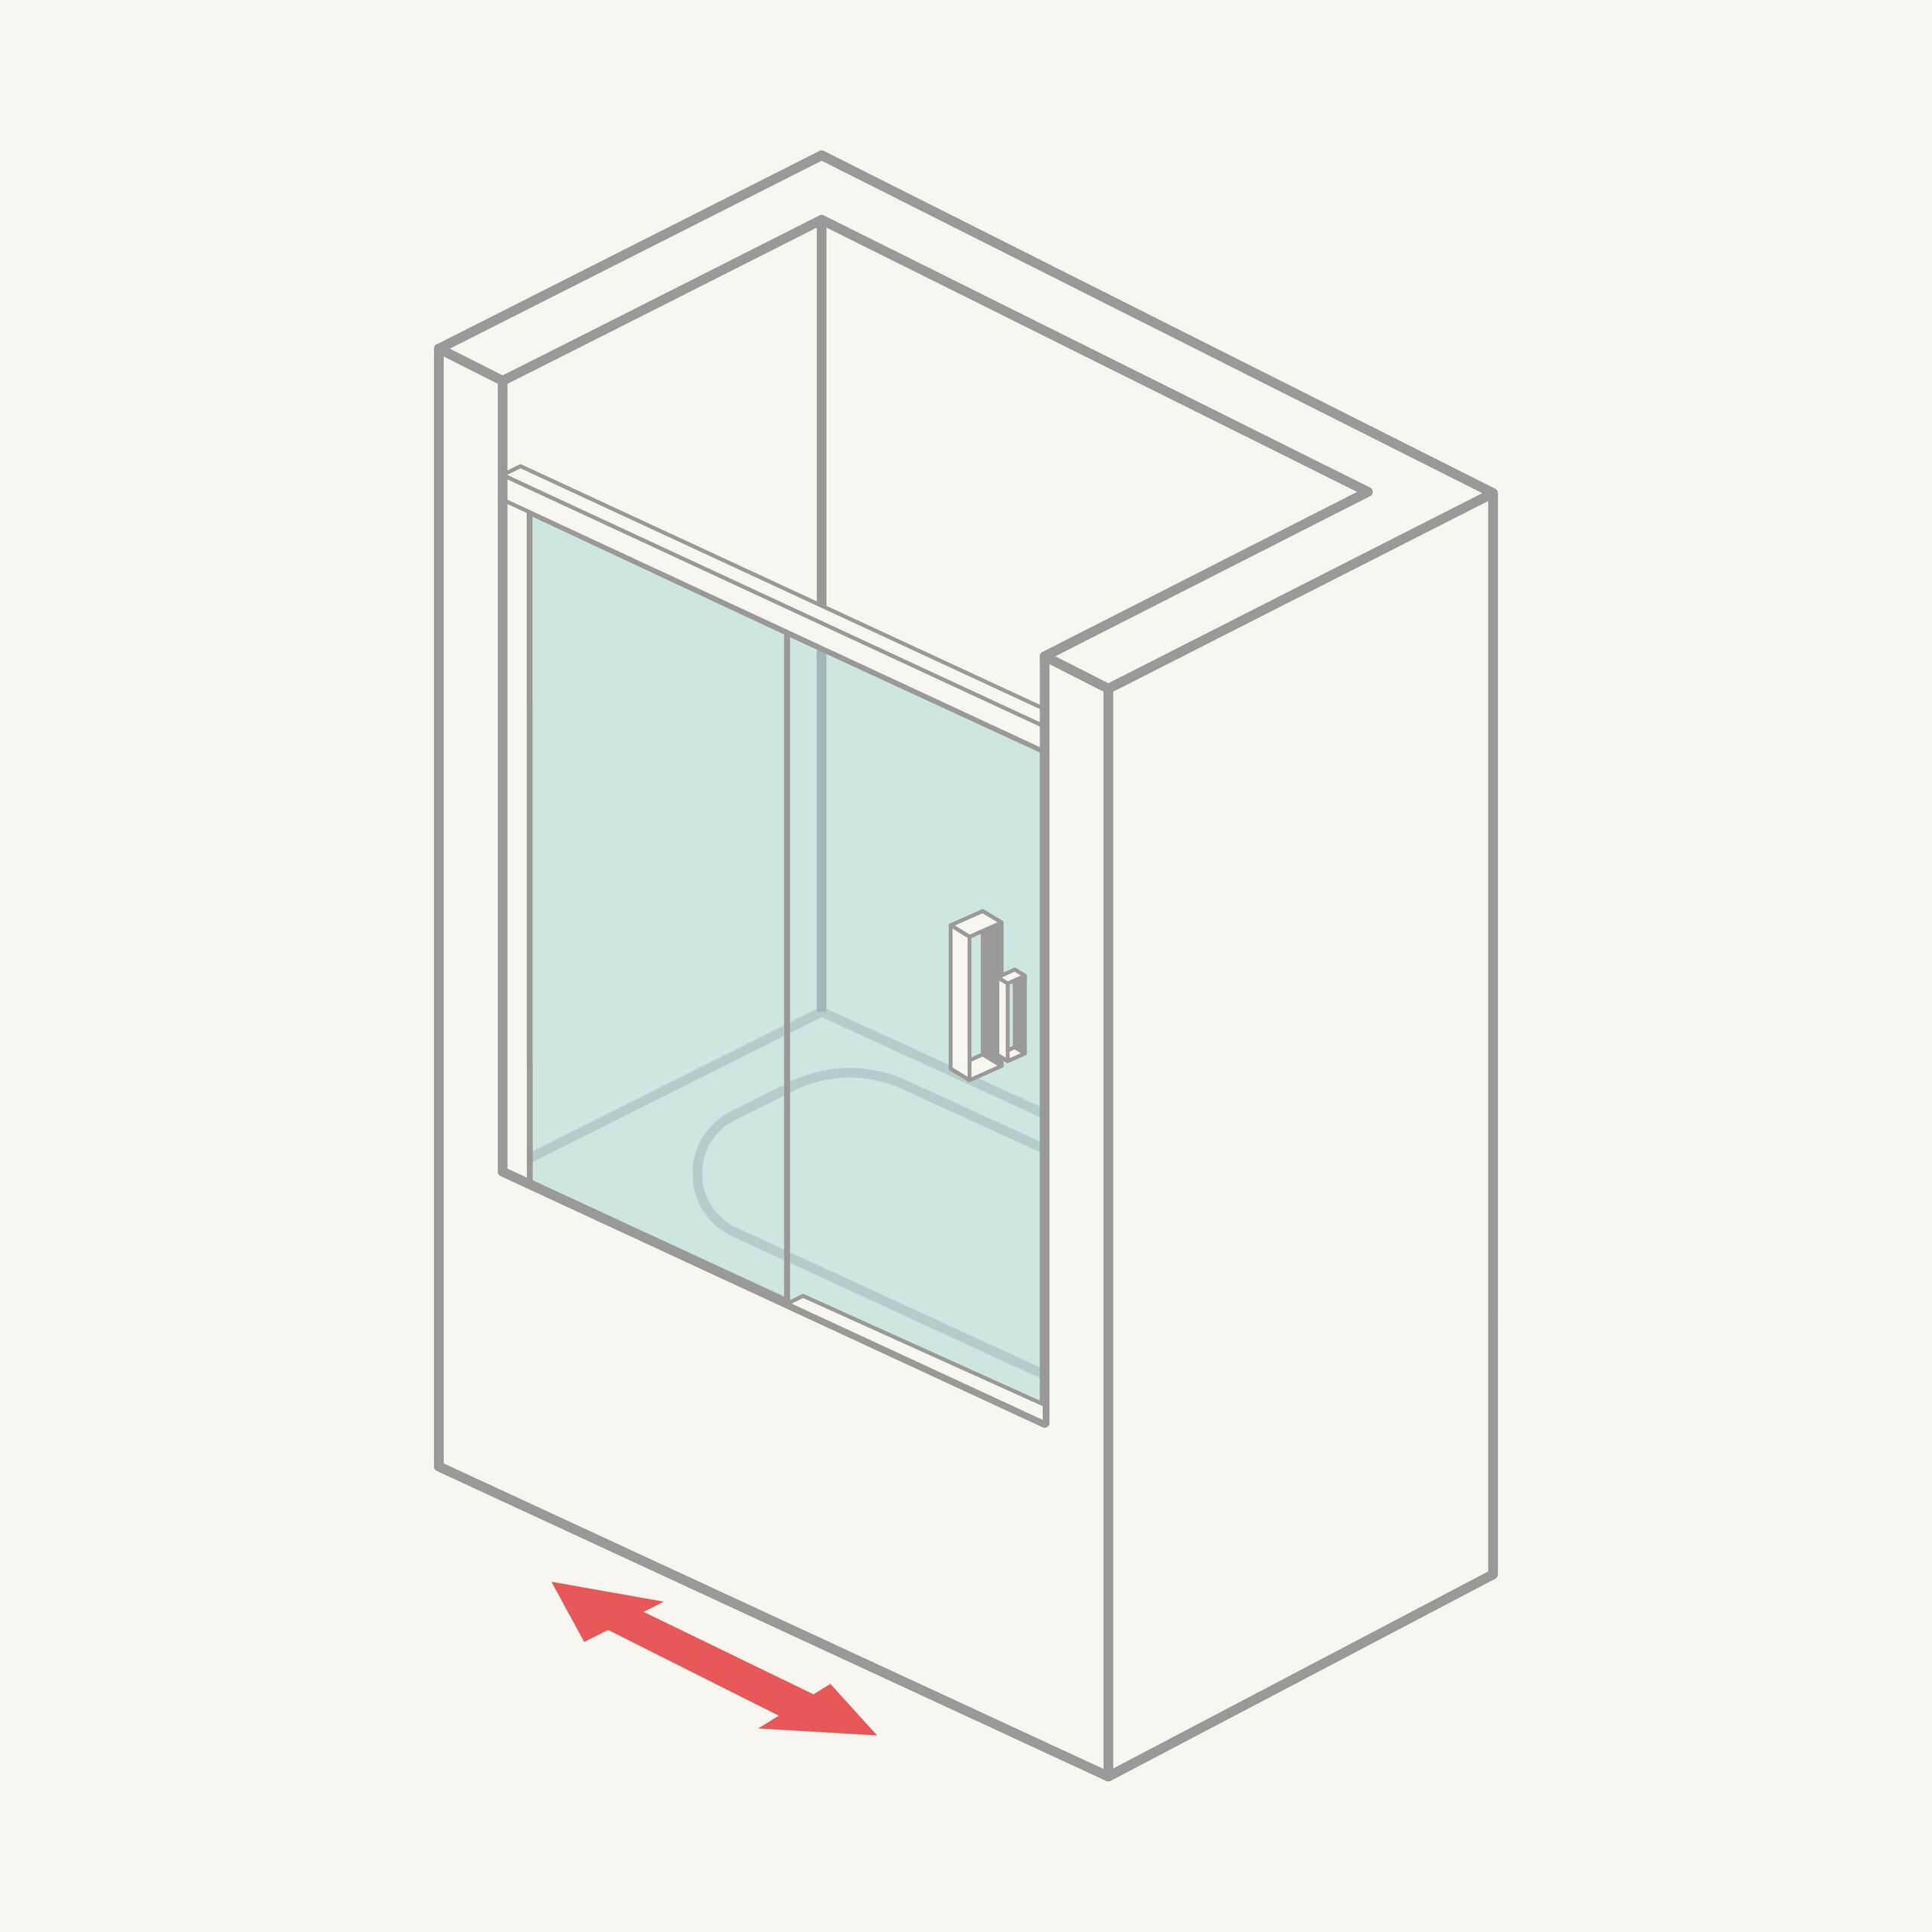 Mampara de bañera frontal (1 fija + 1 corredera)